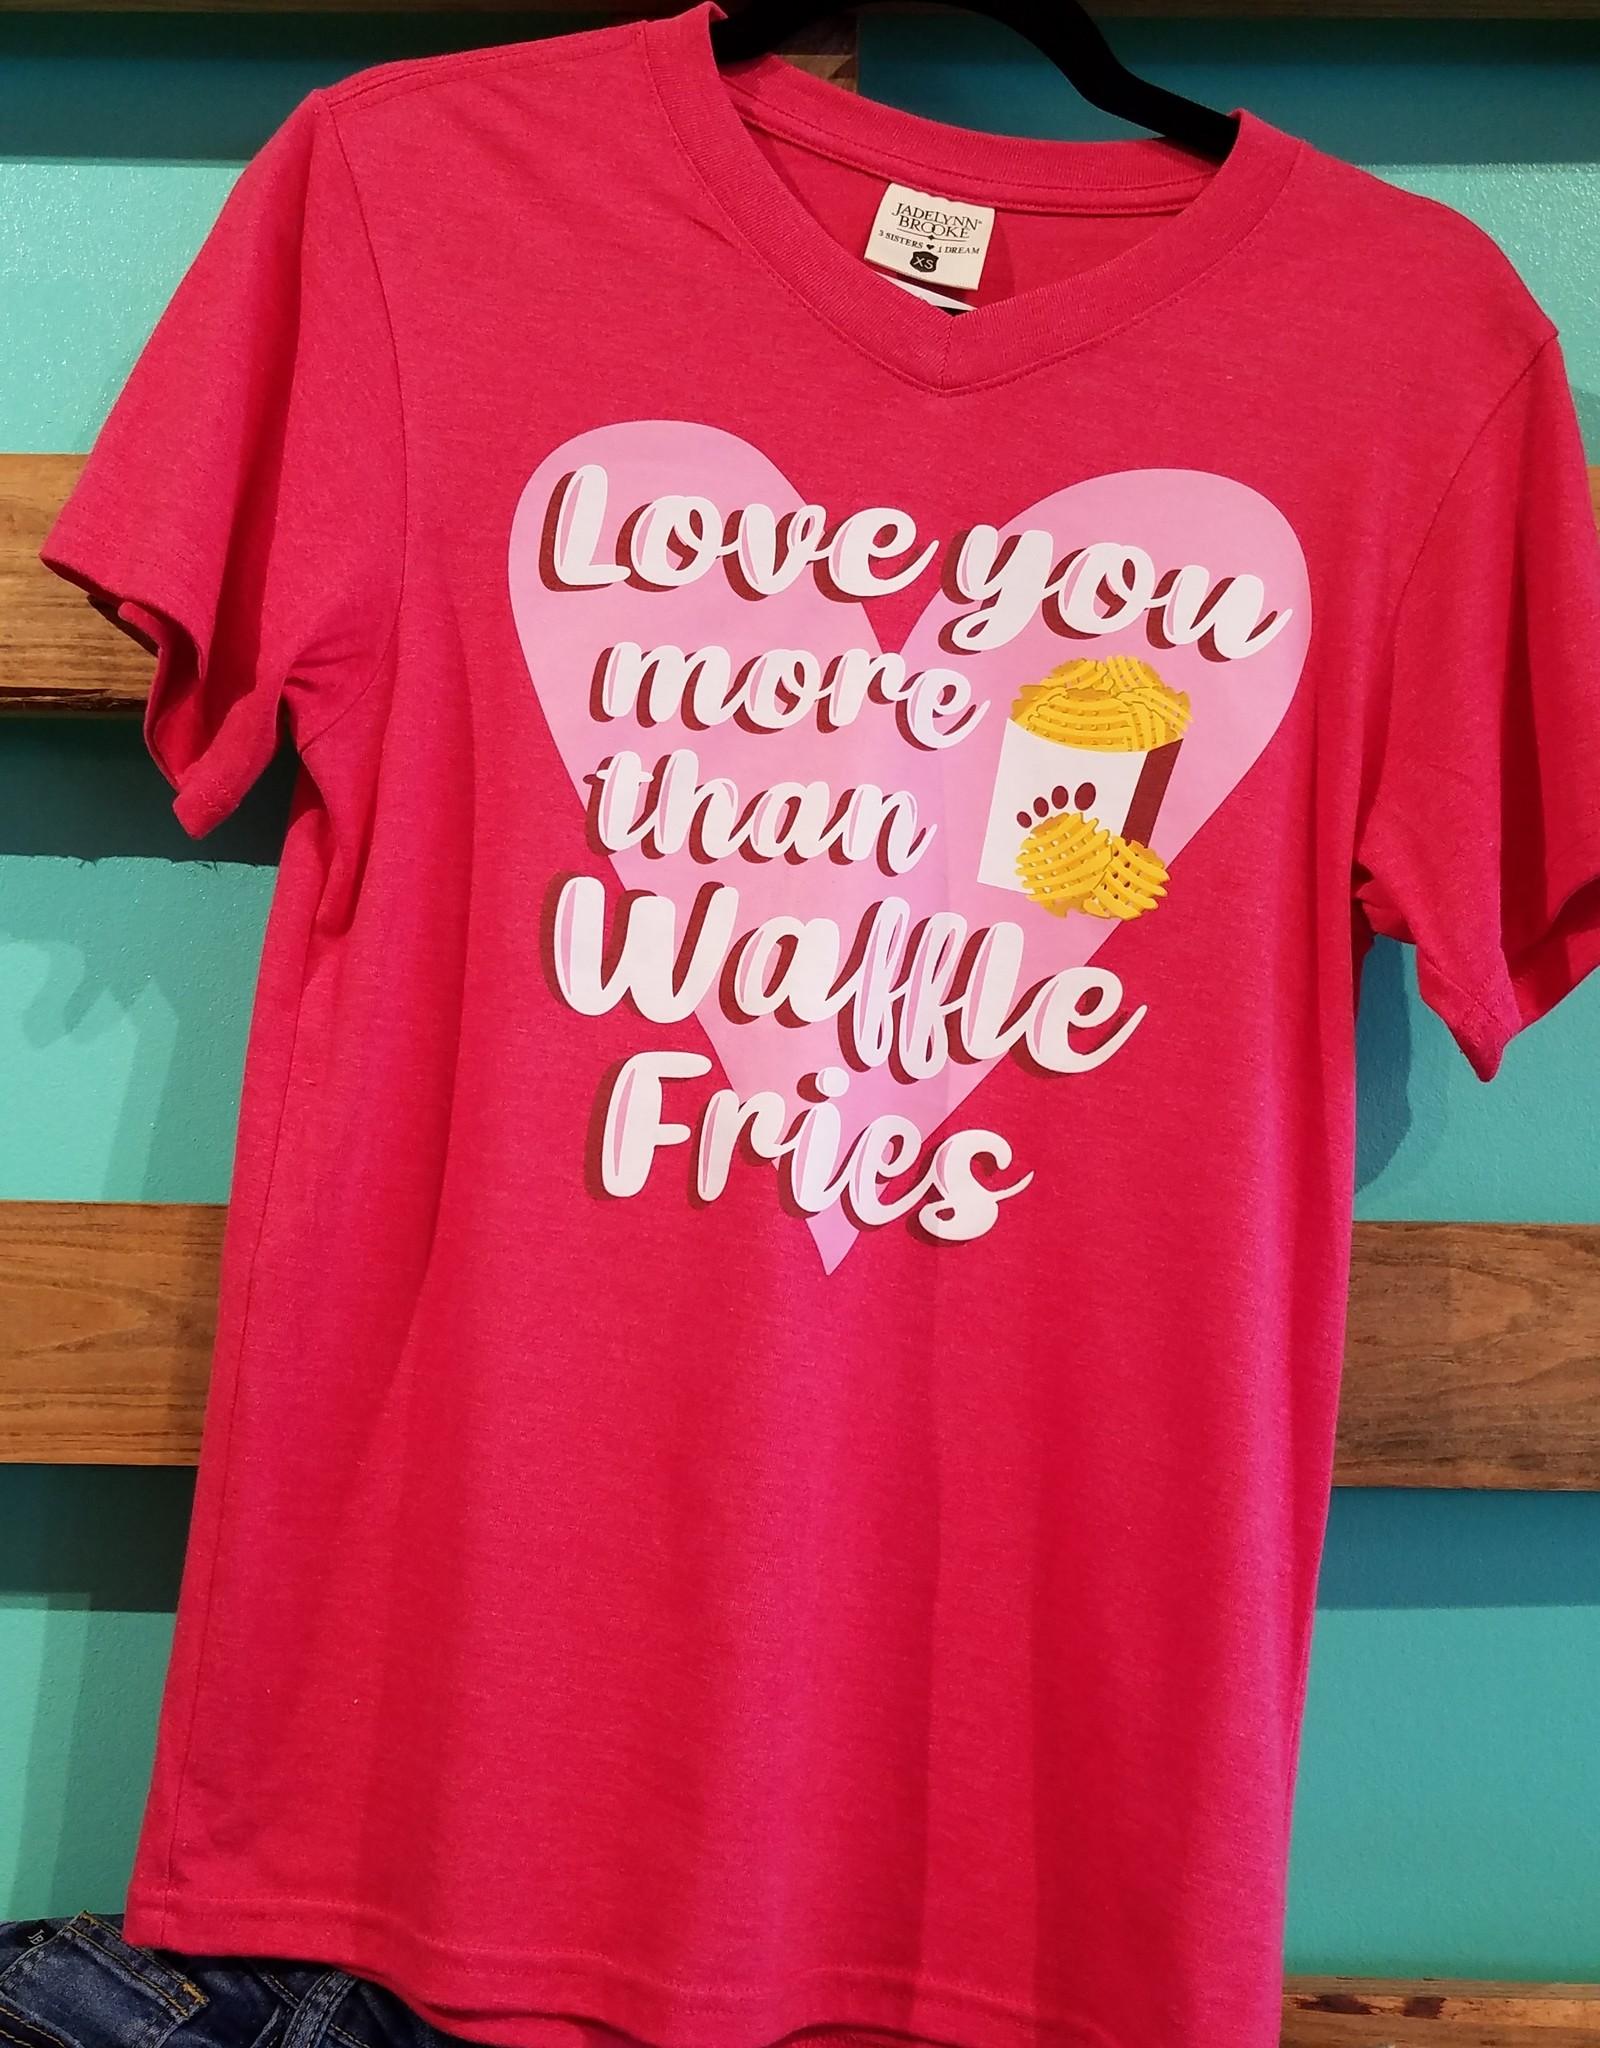 JLB Waffle Fries